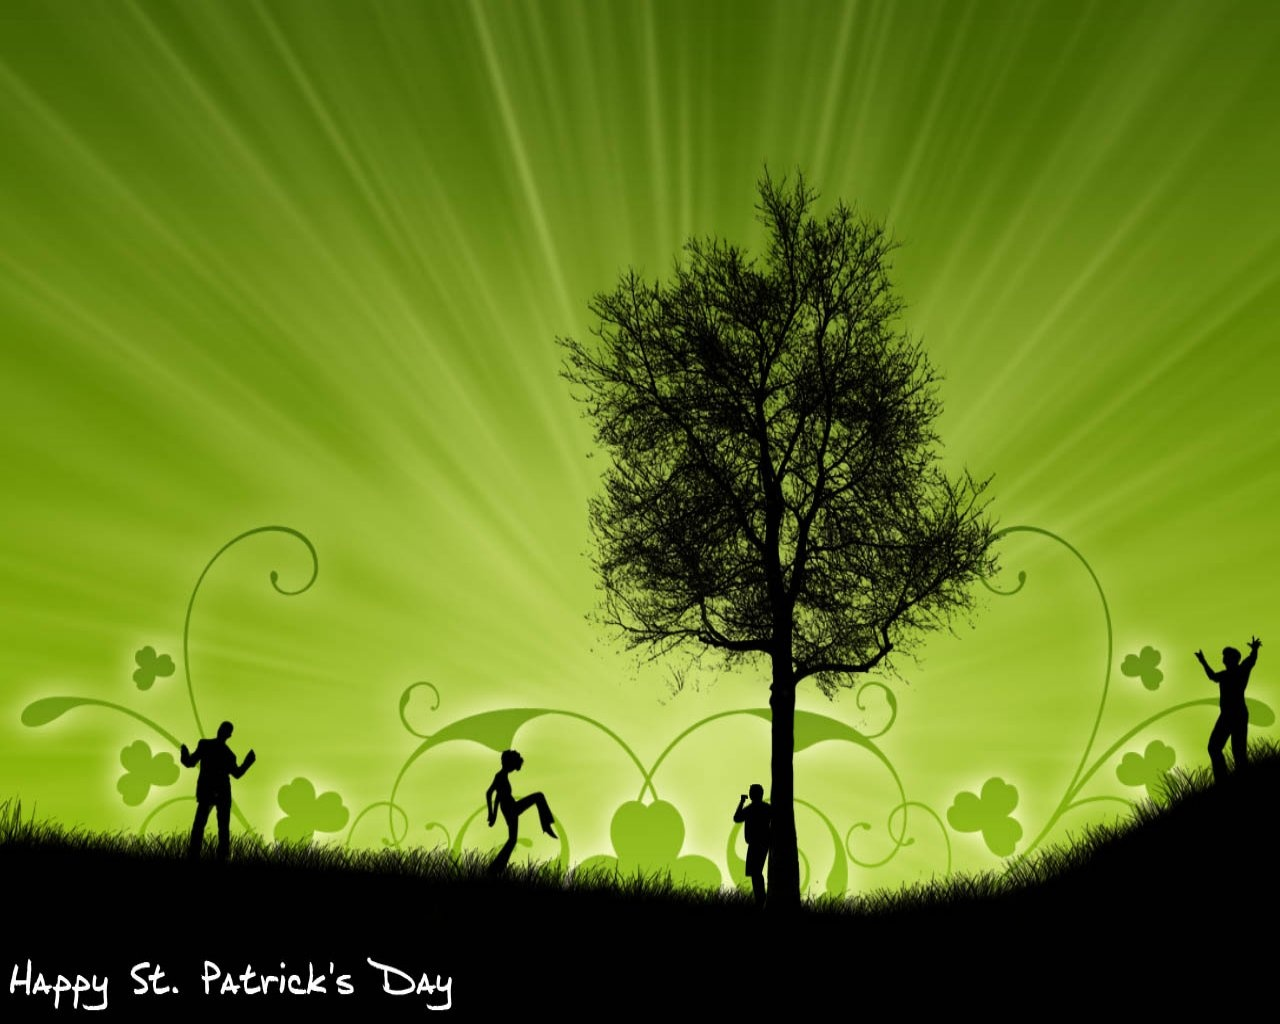 ... .com/view/happy_st_patricks_day_wallpapersuggest_com-1280x1024.html